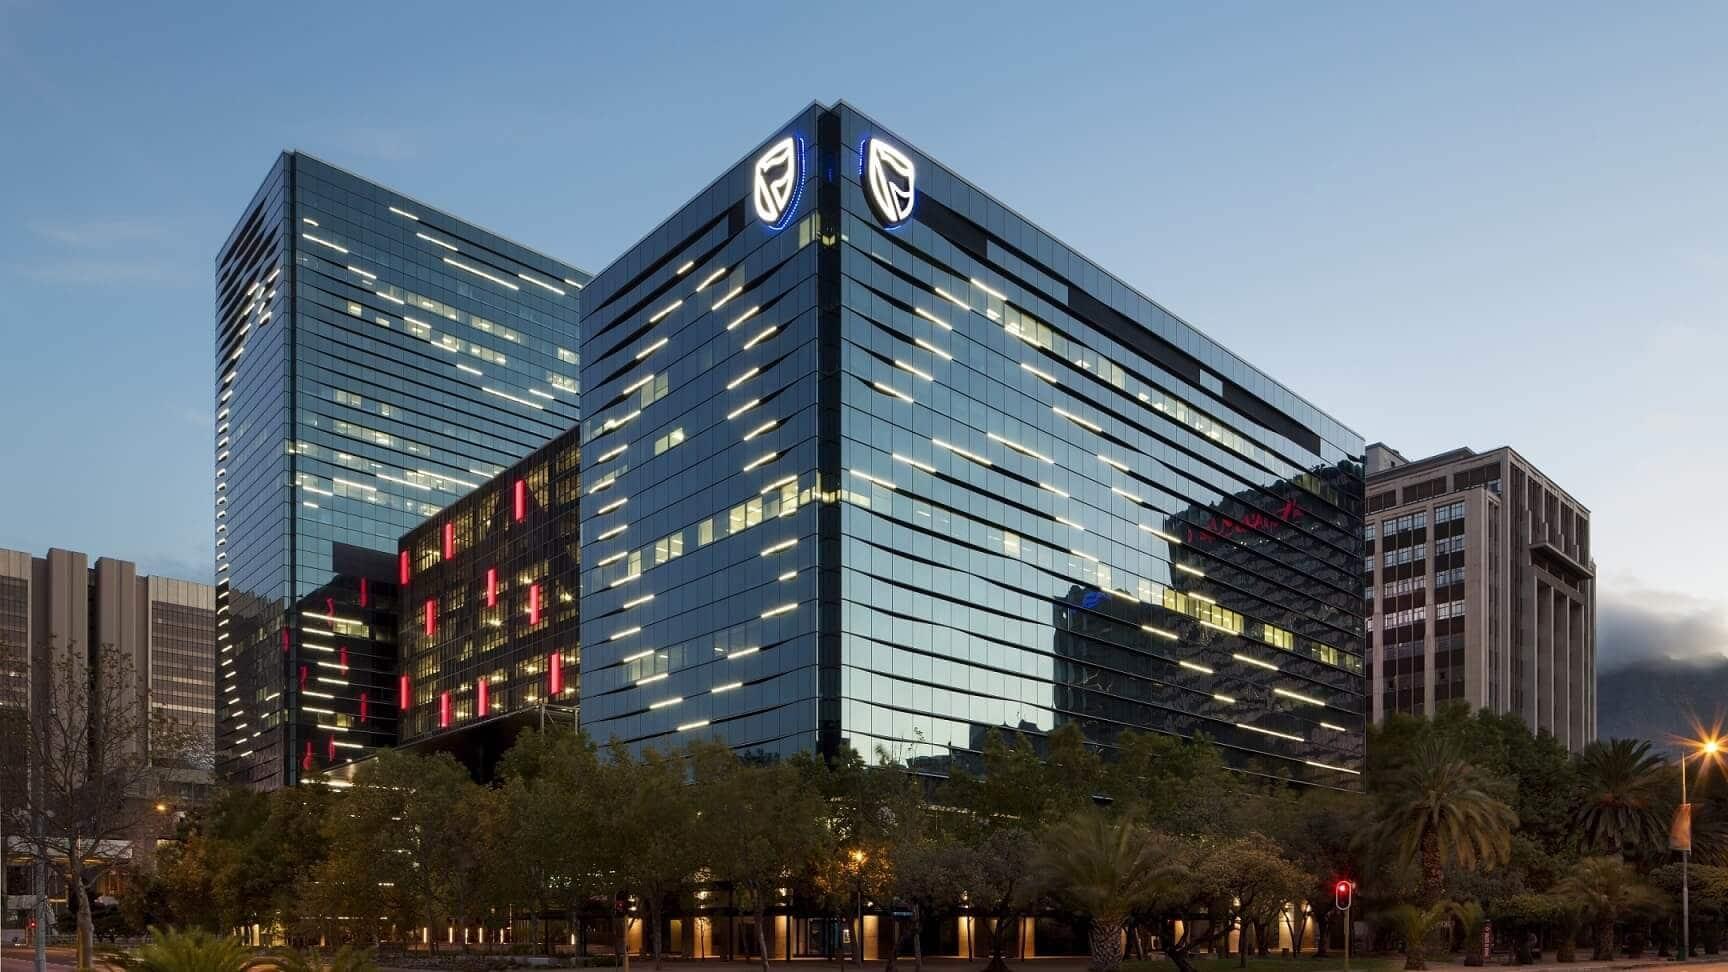 Standard Bank said they take anti-money laundering legislation responsibility seriously